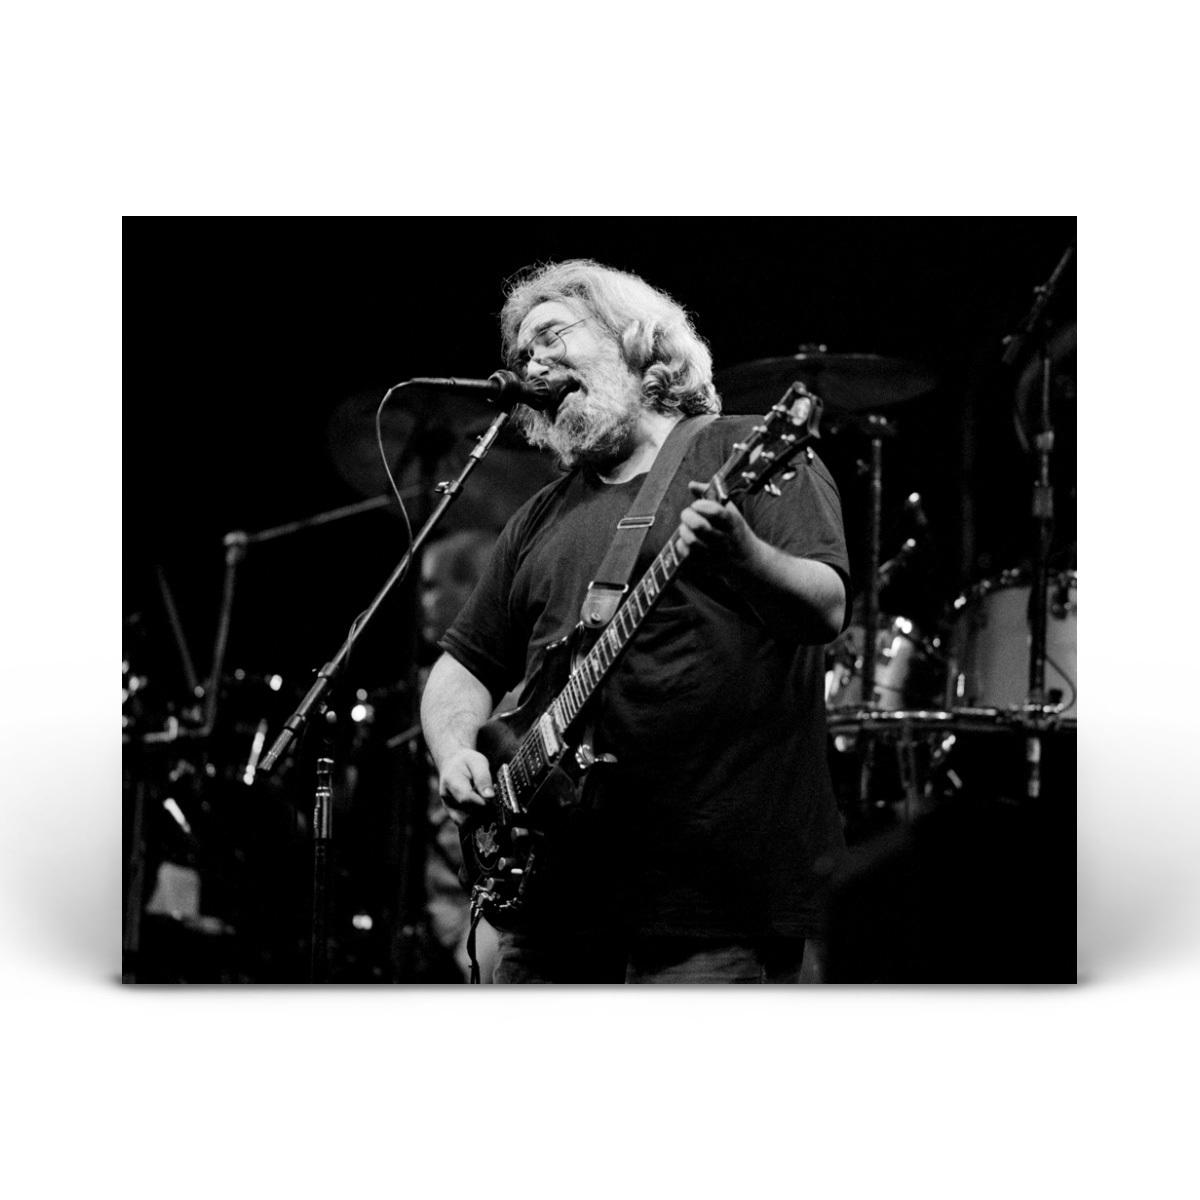 Jerry Garcia - Oakland CA, 12/31/87